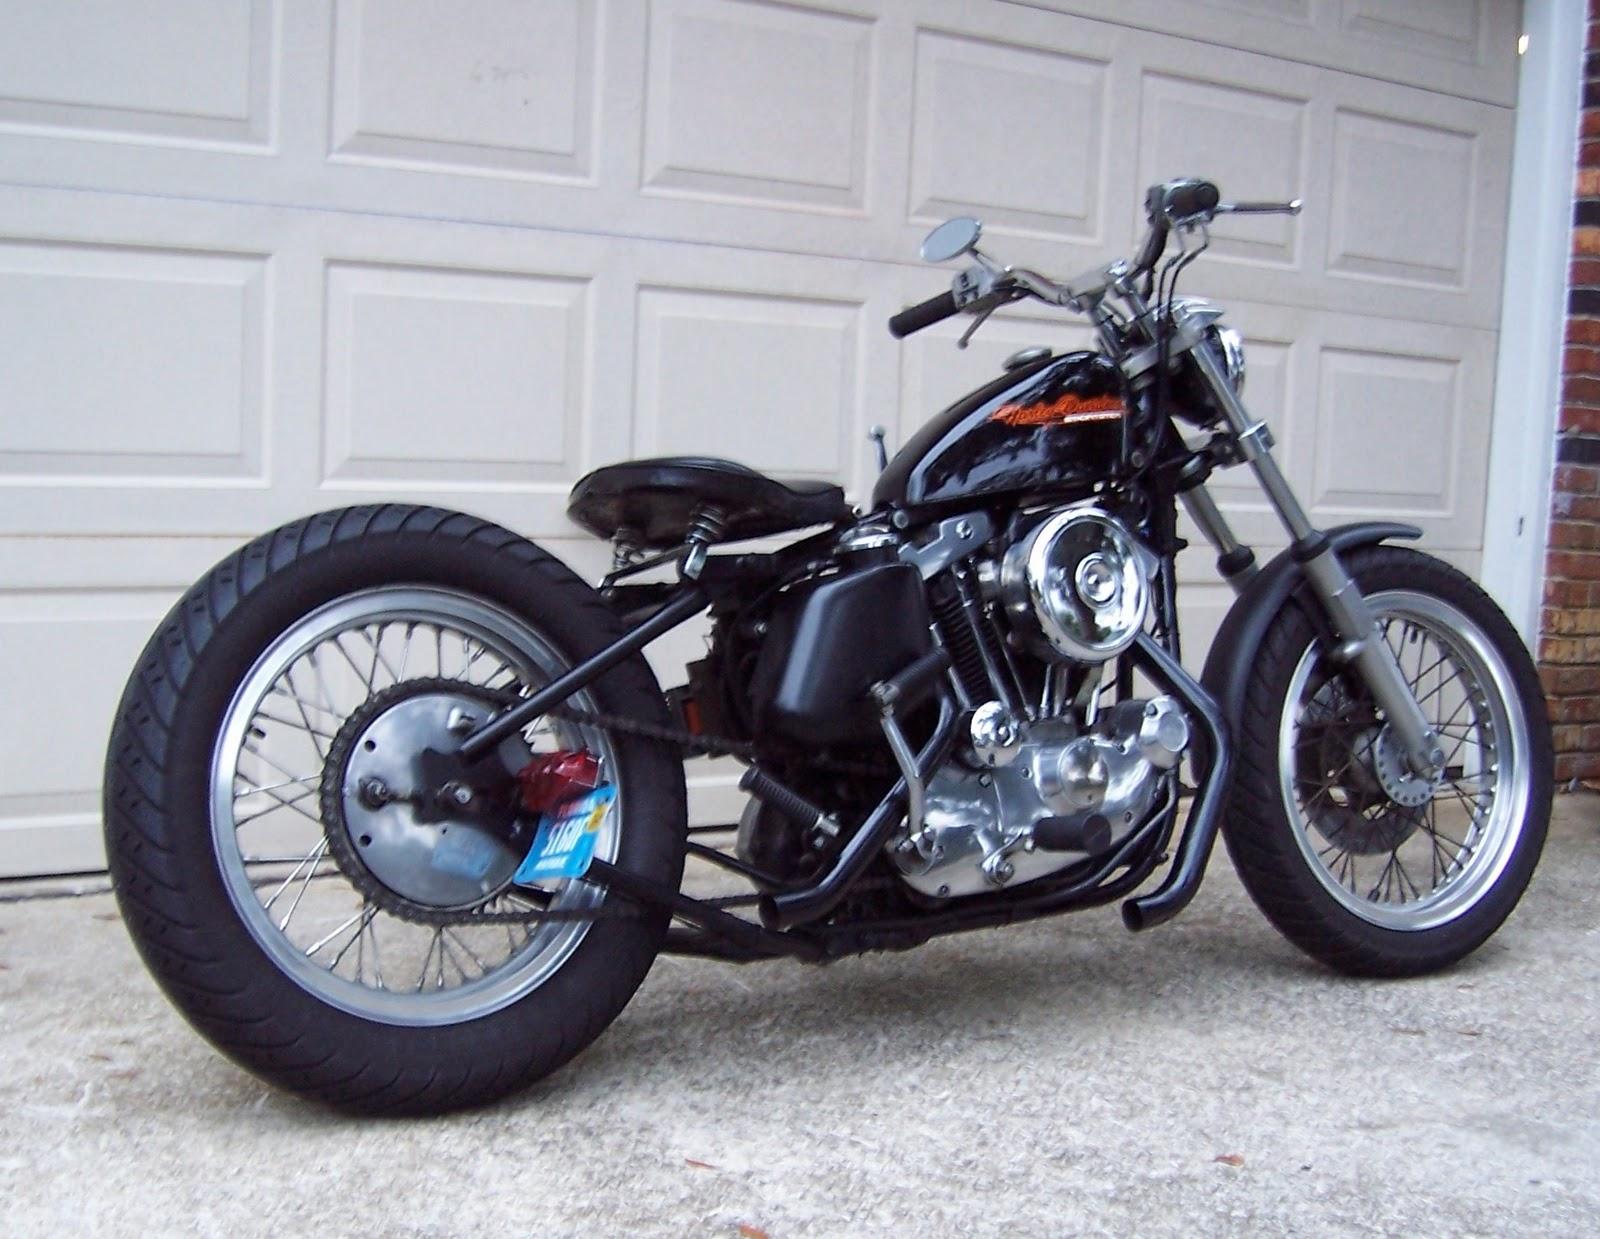 Harley Davidson 1977 Sportster Wiring Diagram On 70 Harley Wiring